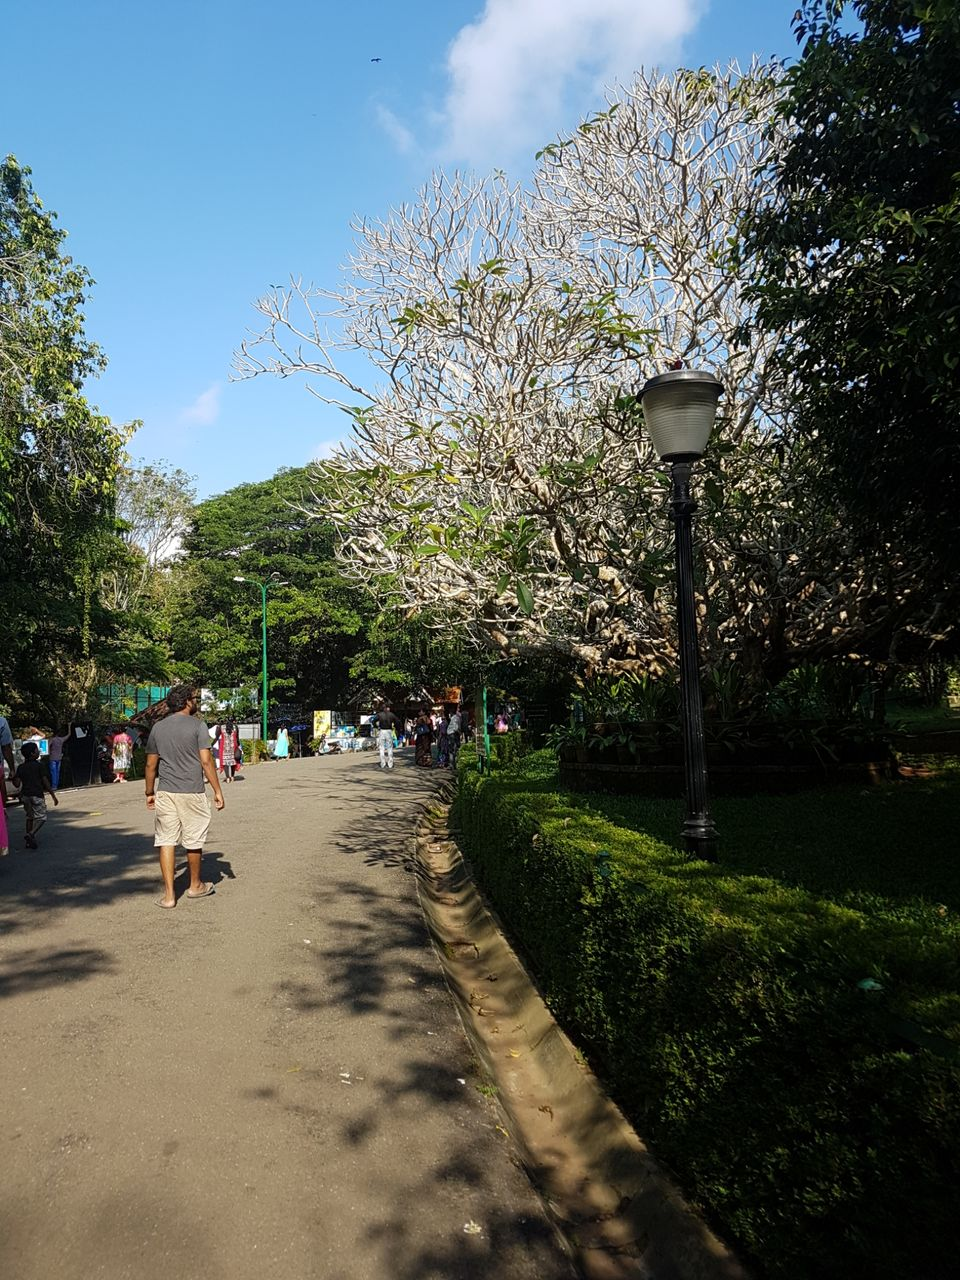 Photo of Napier Museum, Thiruvananthapuram, Kerala, India by The Fervid Traveller